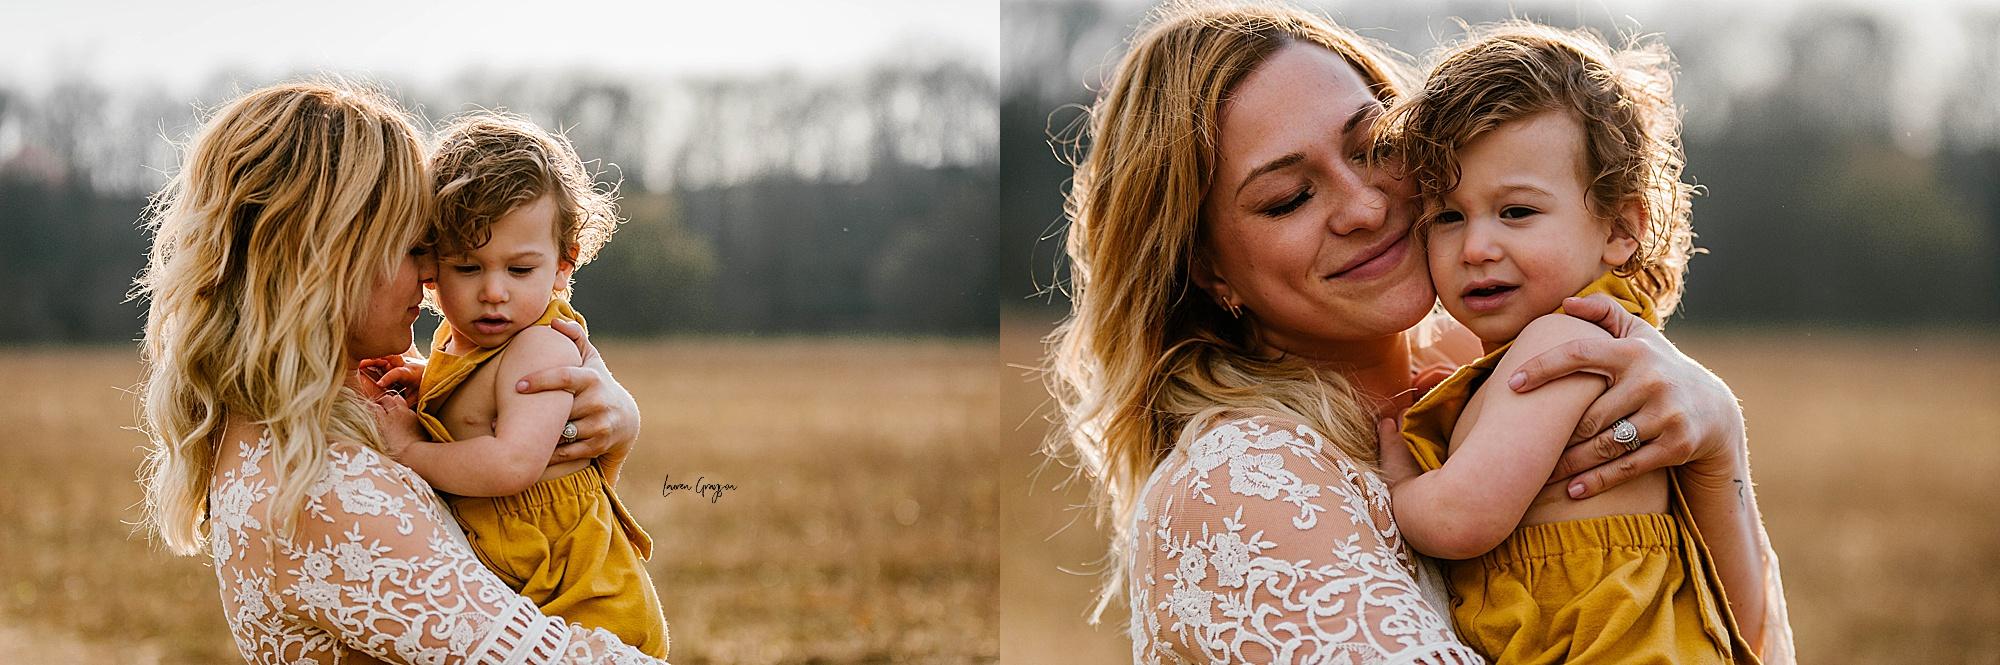 lauren-grayson-photography-akron-ohio-family-mom-boys-field-spring-outdoor-session_0018.jpg